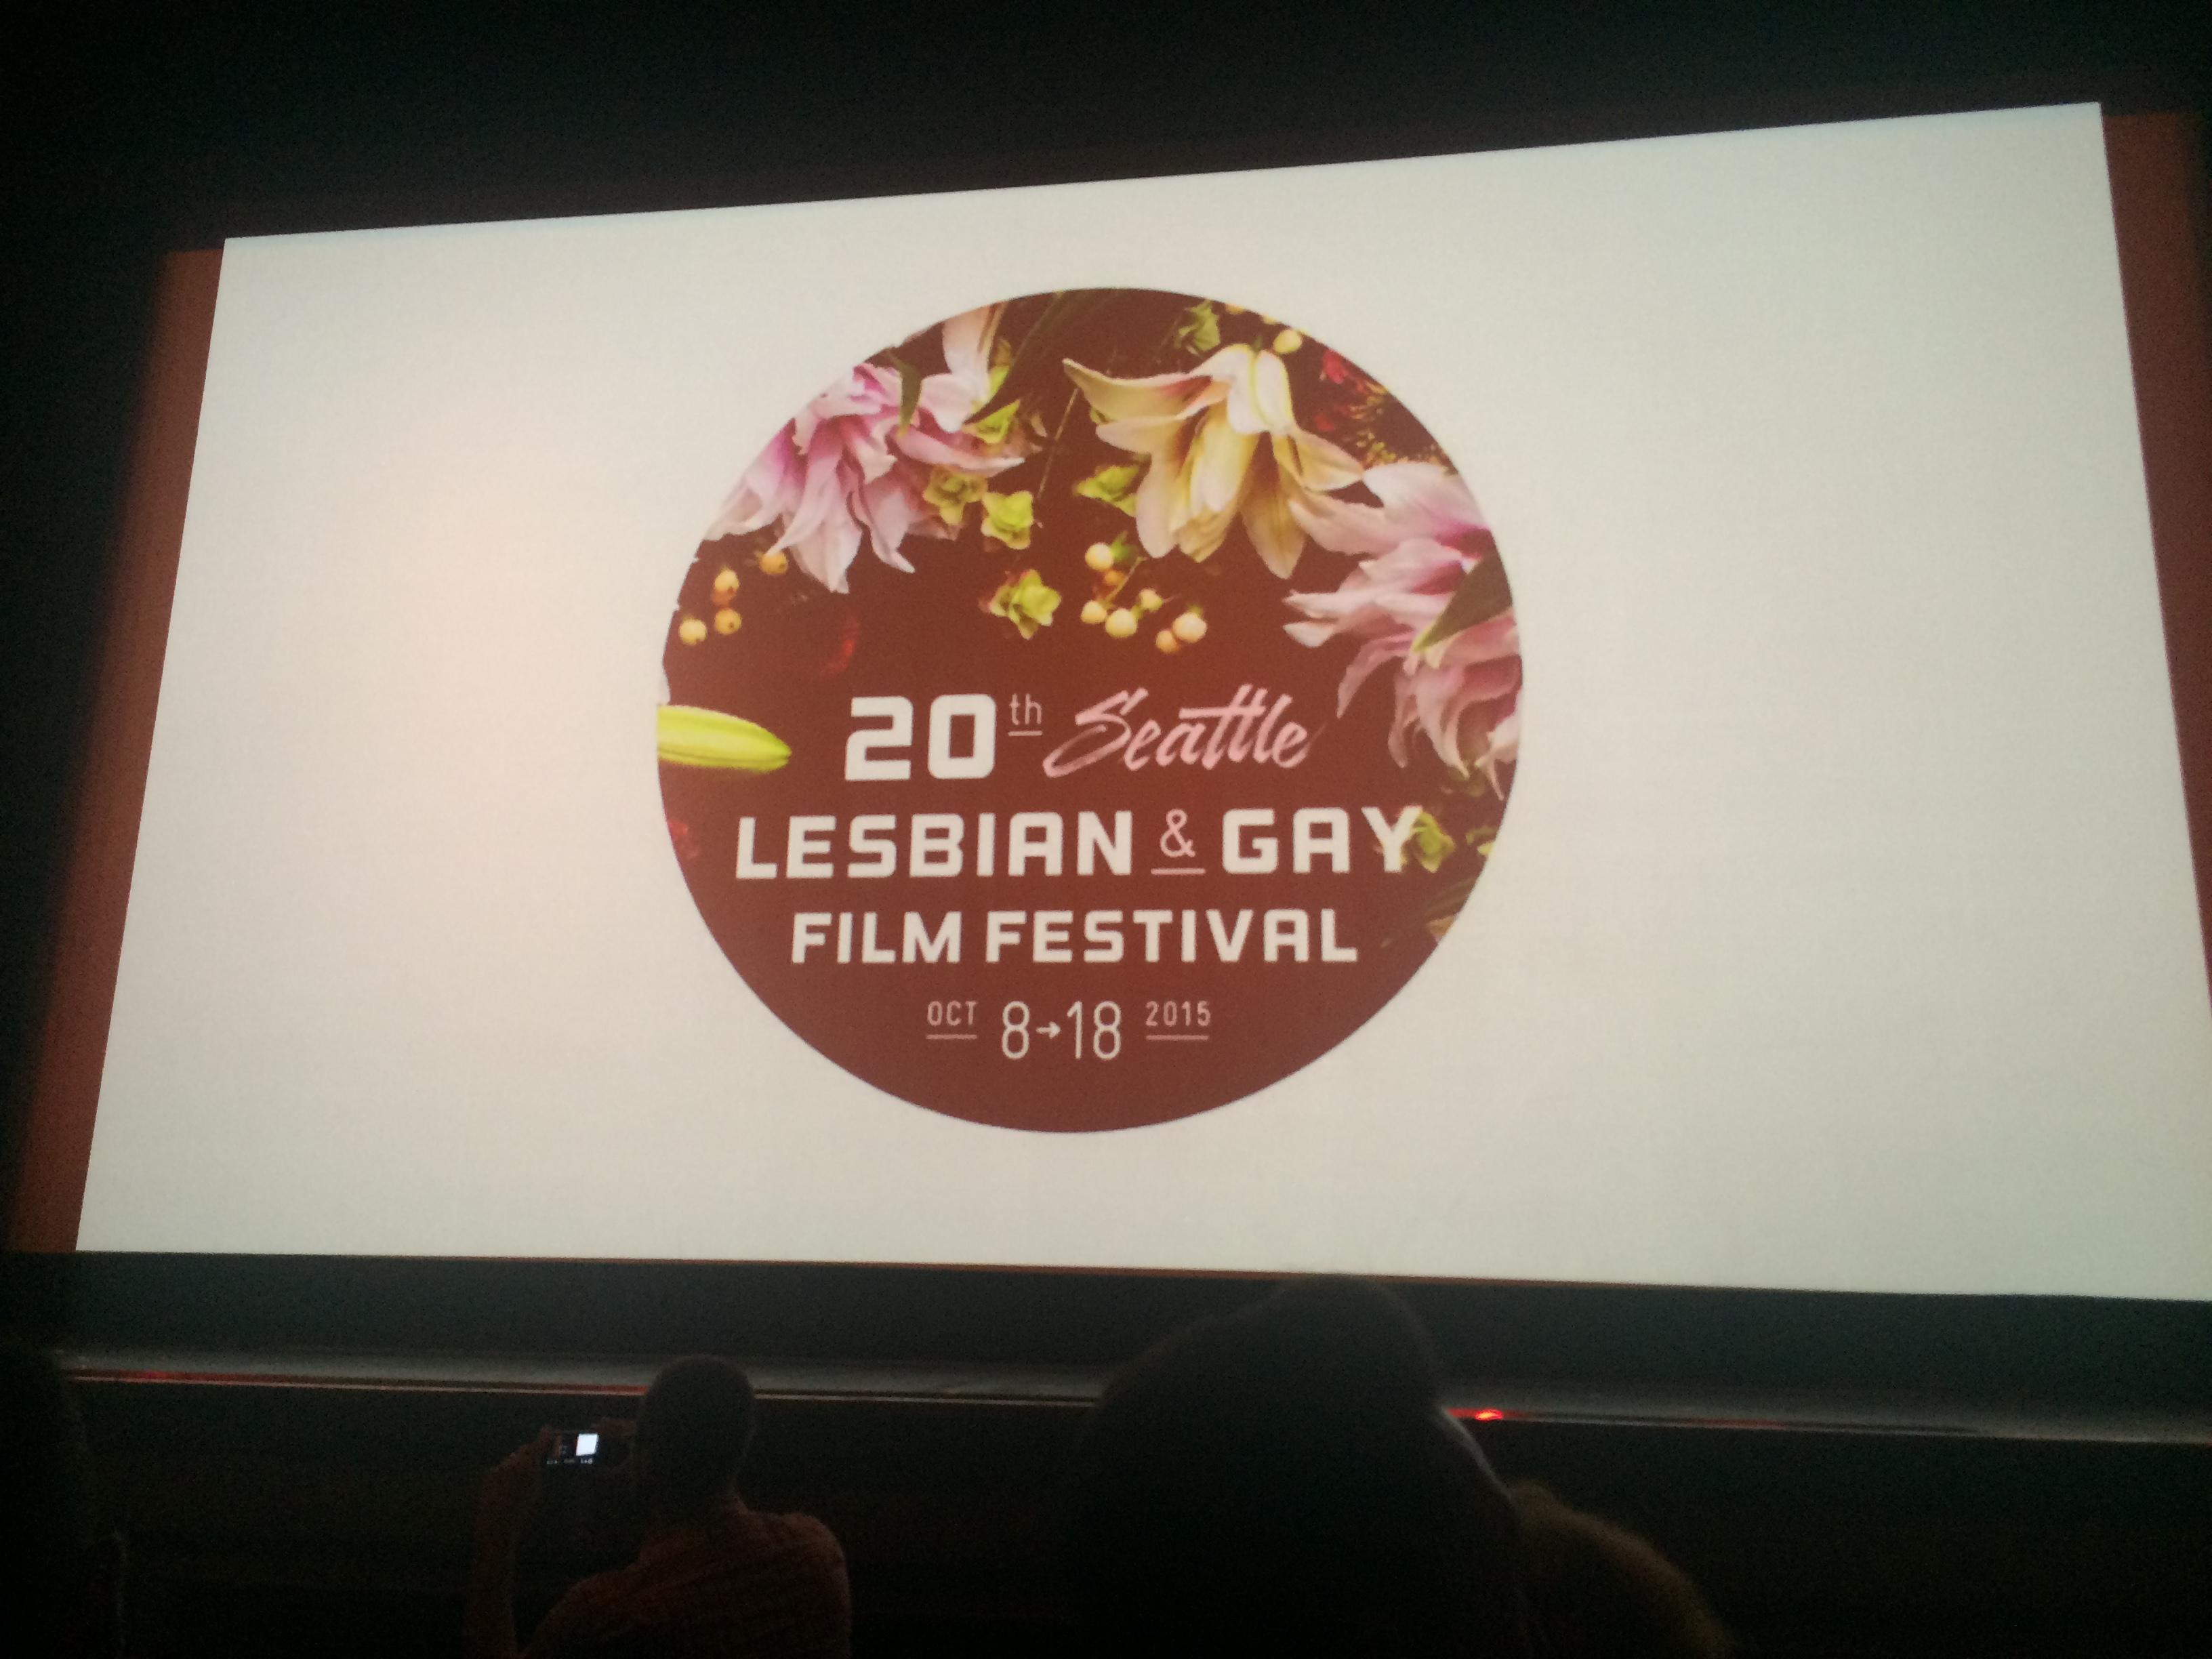 Seattle Lesbian Gay Film Festival